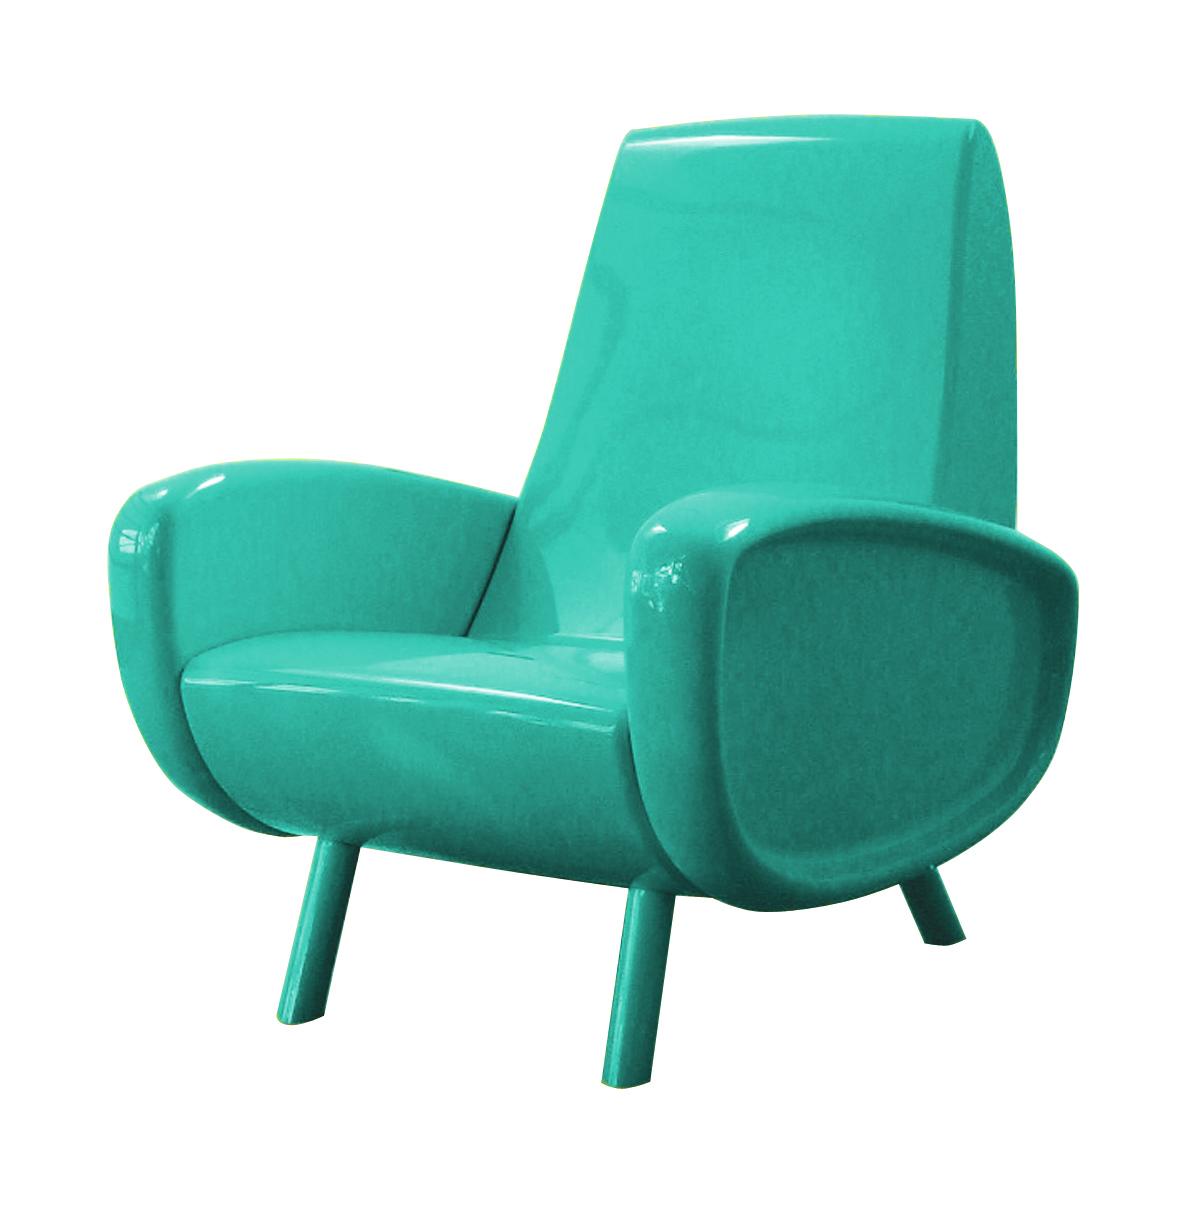 tendance 50 39 fauteuil enfant blog bazar. Black Bedroom Furniture Sets. Home Design Ideas